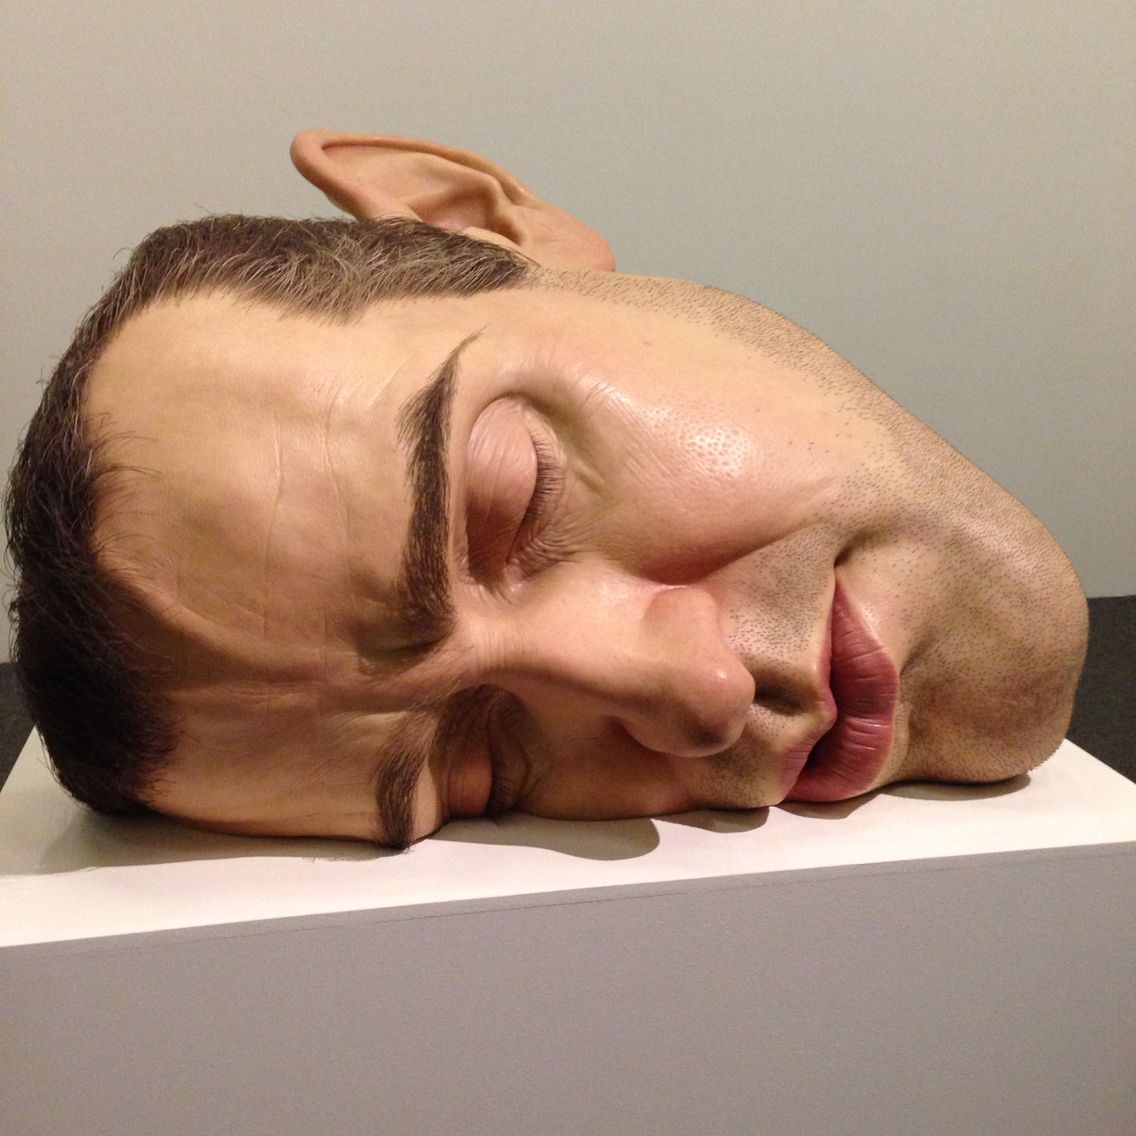 Ron Mueck exposition, São Paulo, Brazil